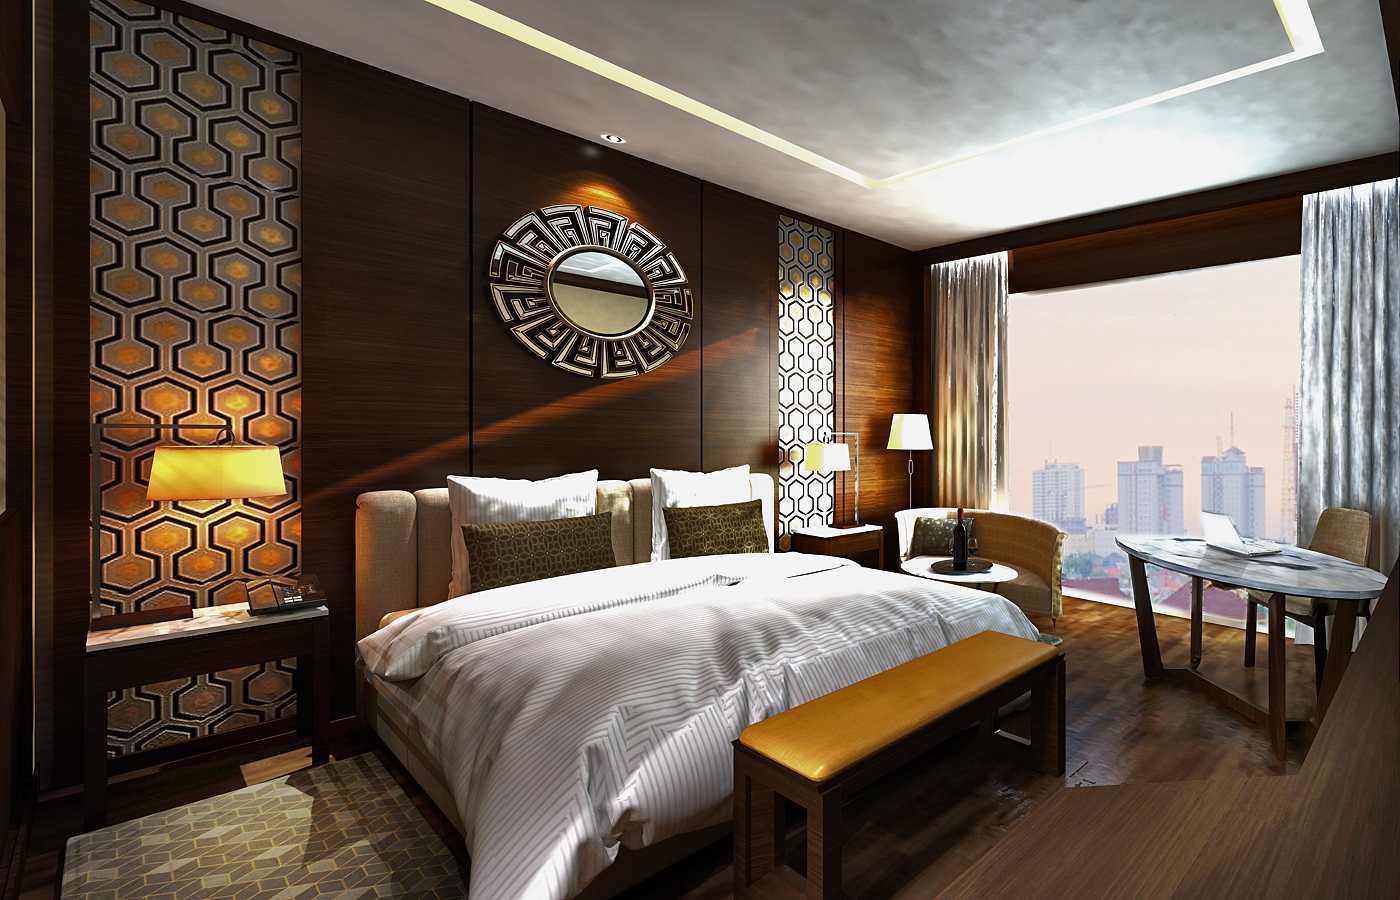 Rinto Katili, S.s.n, M.m Hotel Unit Surabaya Surabaya Hotel_Room Unit_View To Bedroom Kontemporer  29771